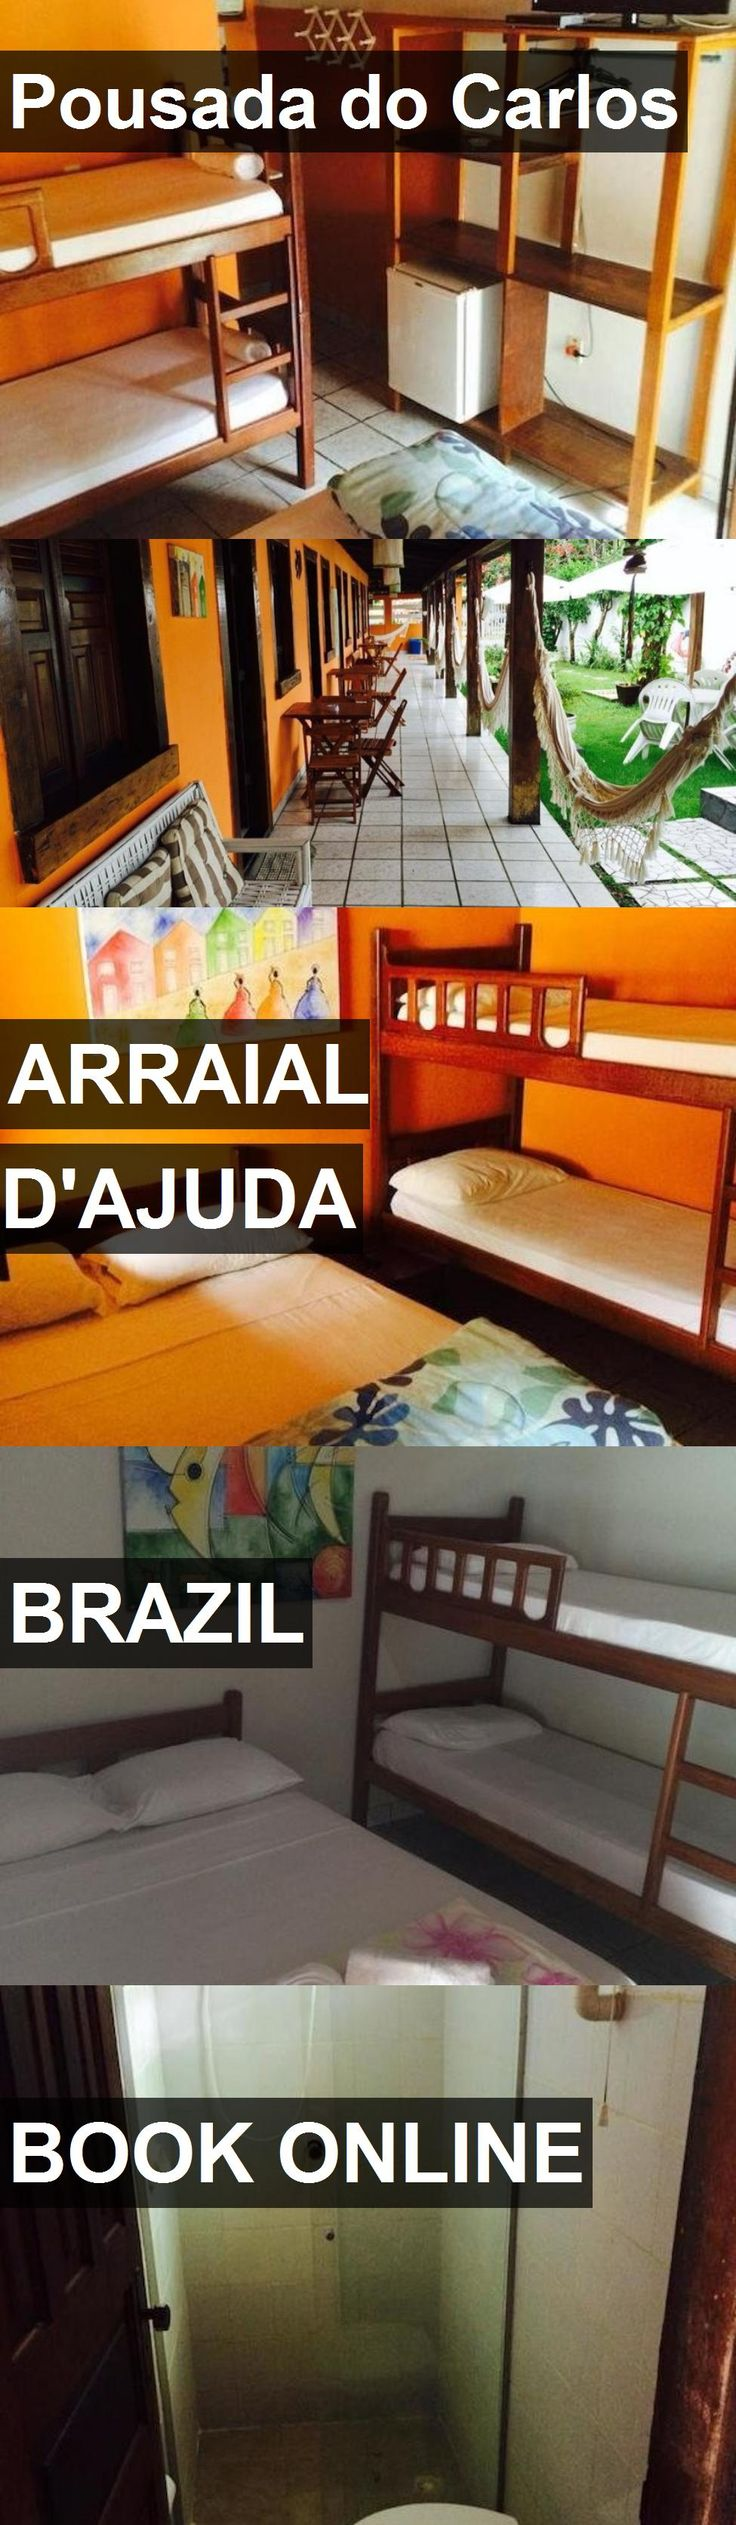 Hotel Pousada do Carlos in Arraial D'Ajuda, Brazil. For more information, photos, reviews and best prices please follow the link. #Brazil #ArraialD'Ajuda #PousadadoCarlos #hotel #travel #vacation